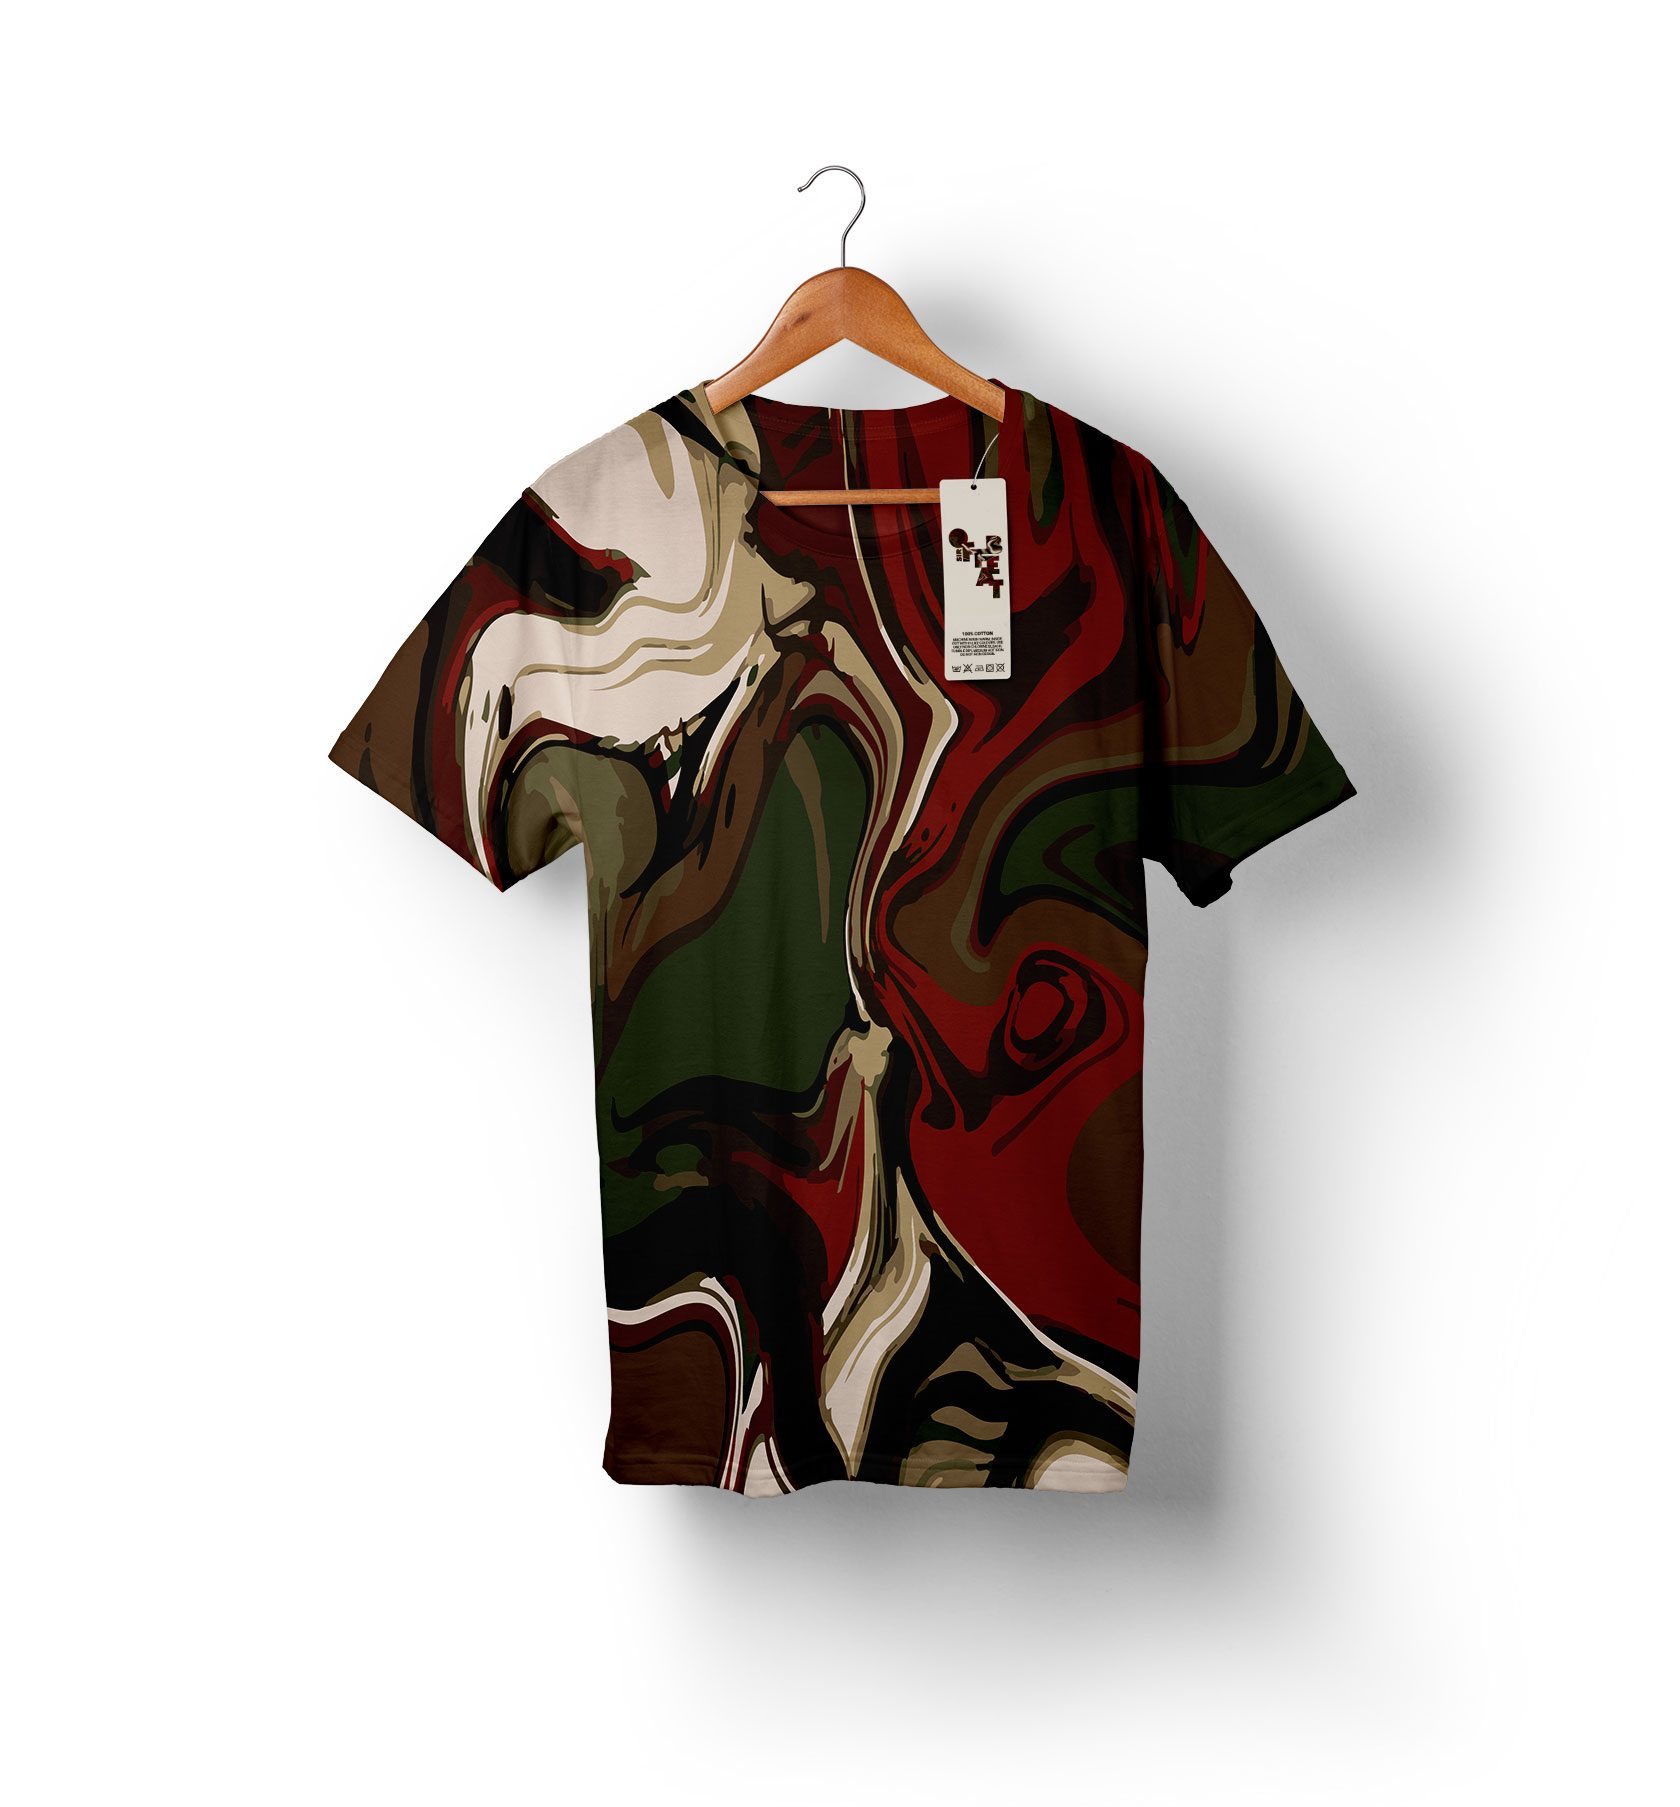 Sir Offbeat Merchandise Design by Toronto Graphic Design Firm Furia